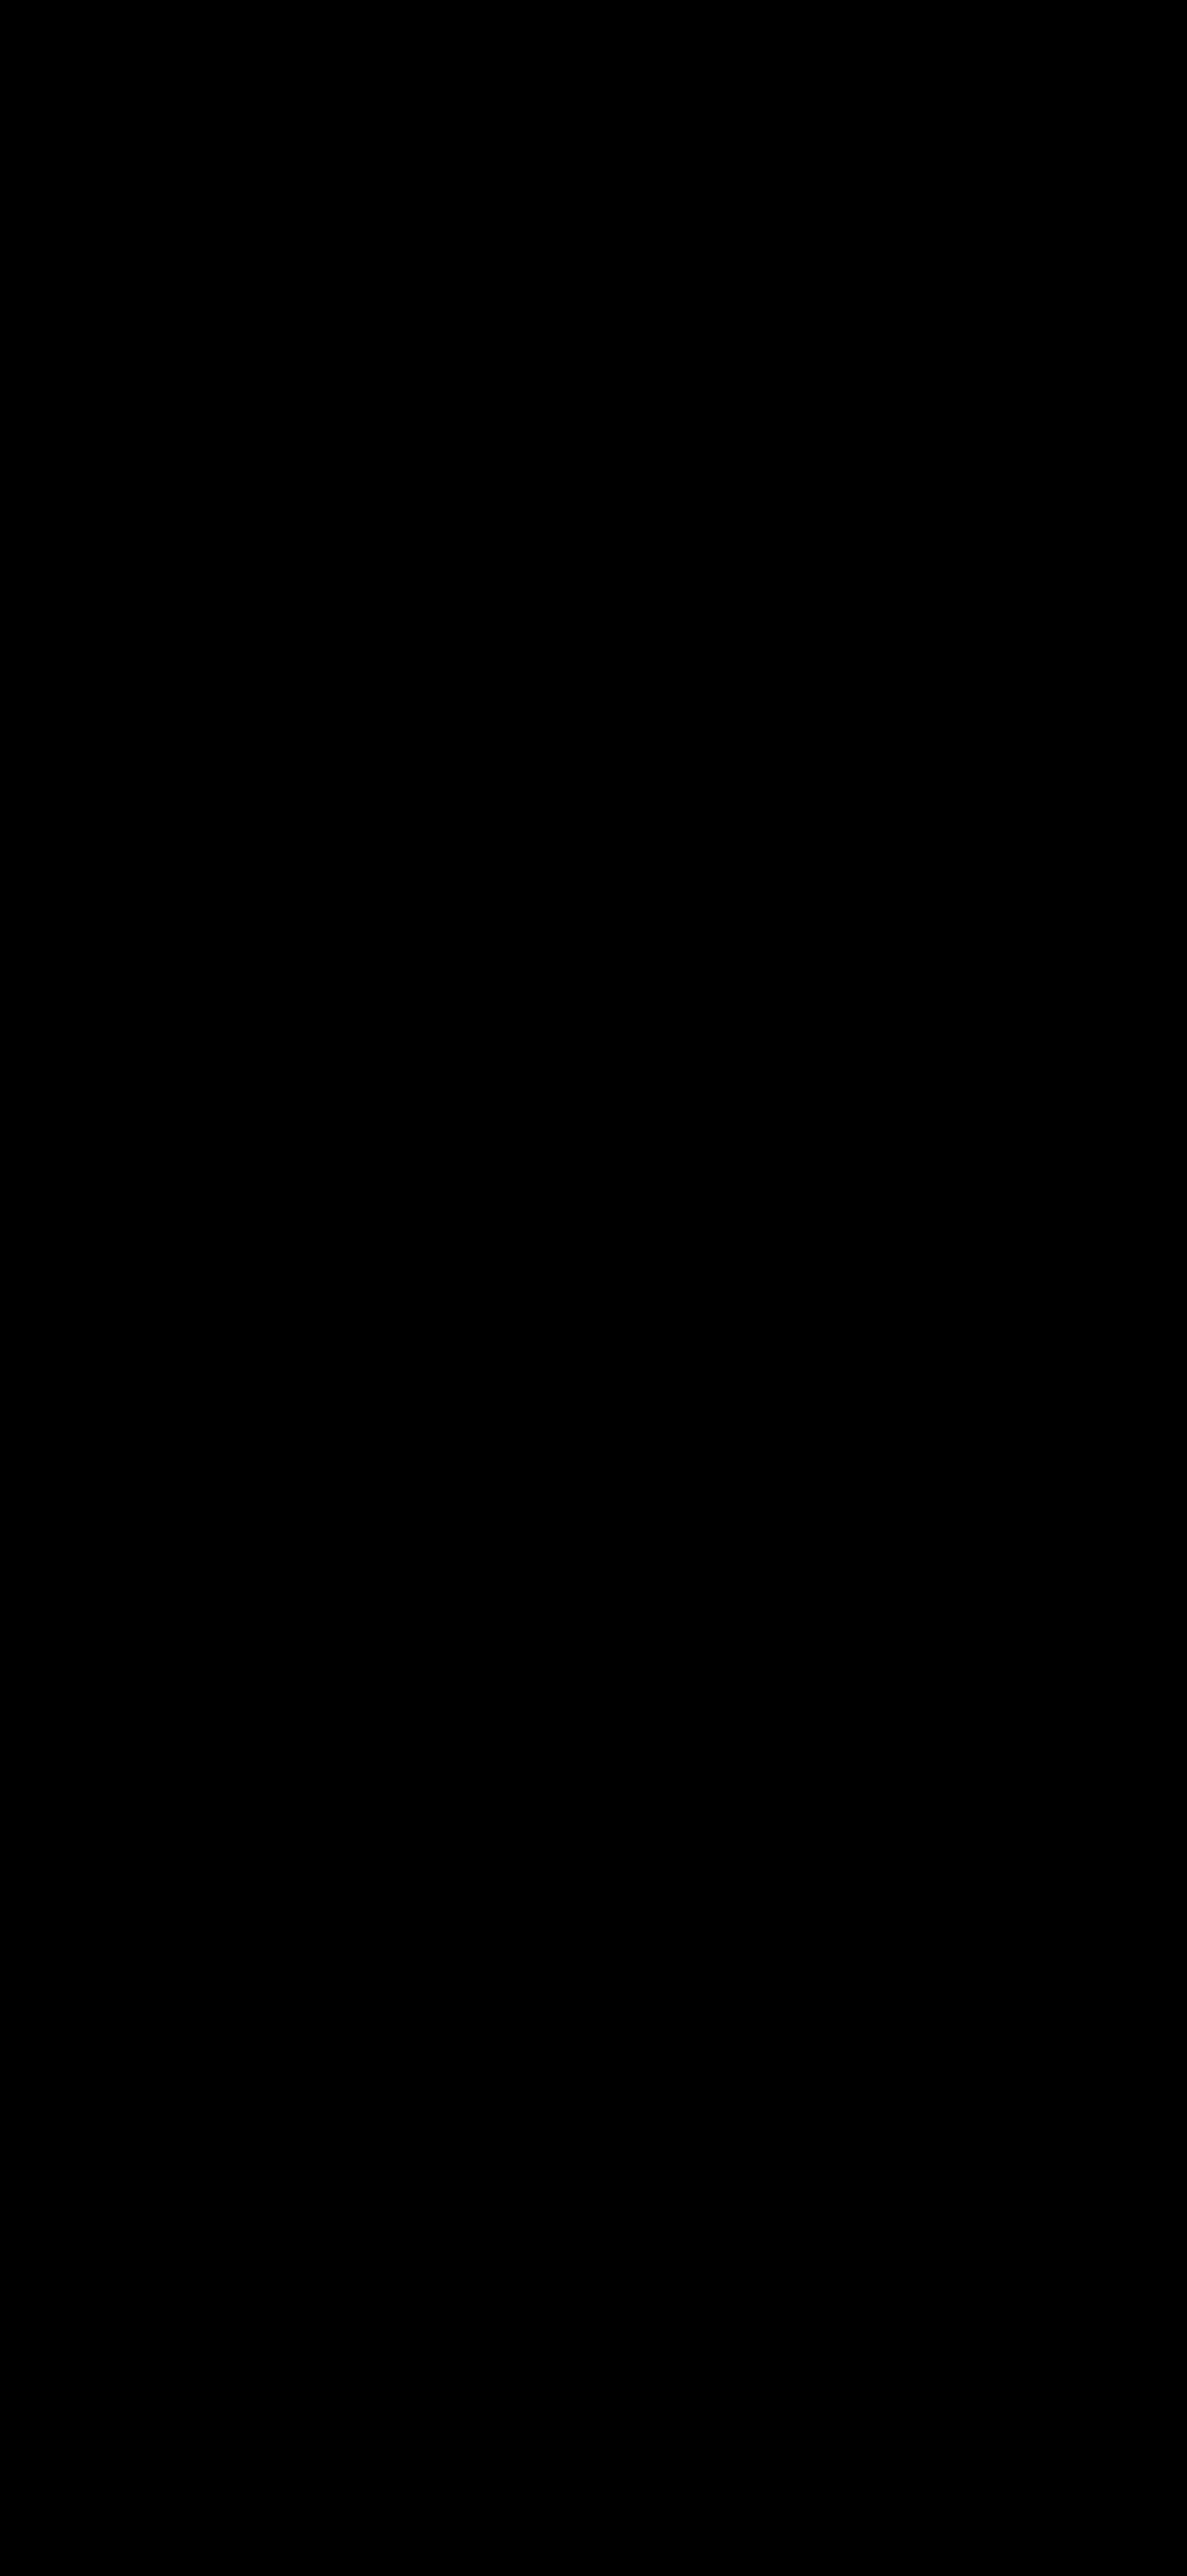 2000x4341 Filewineglass.svg